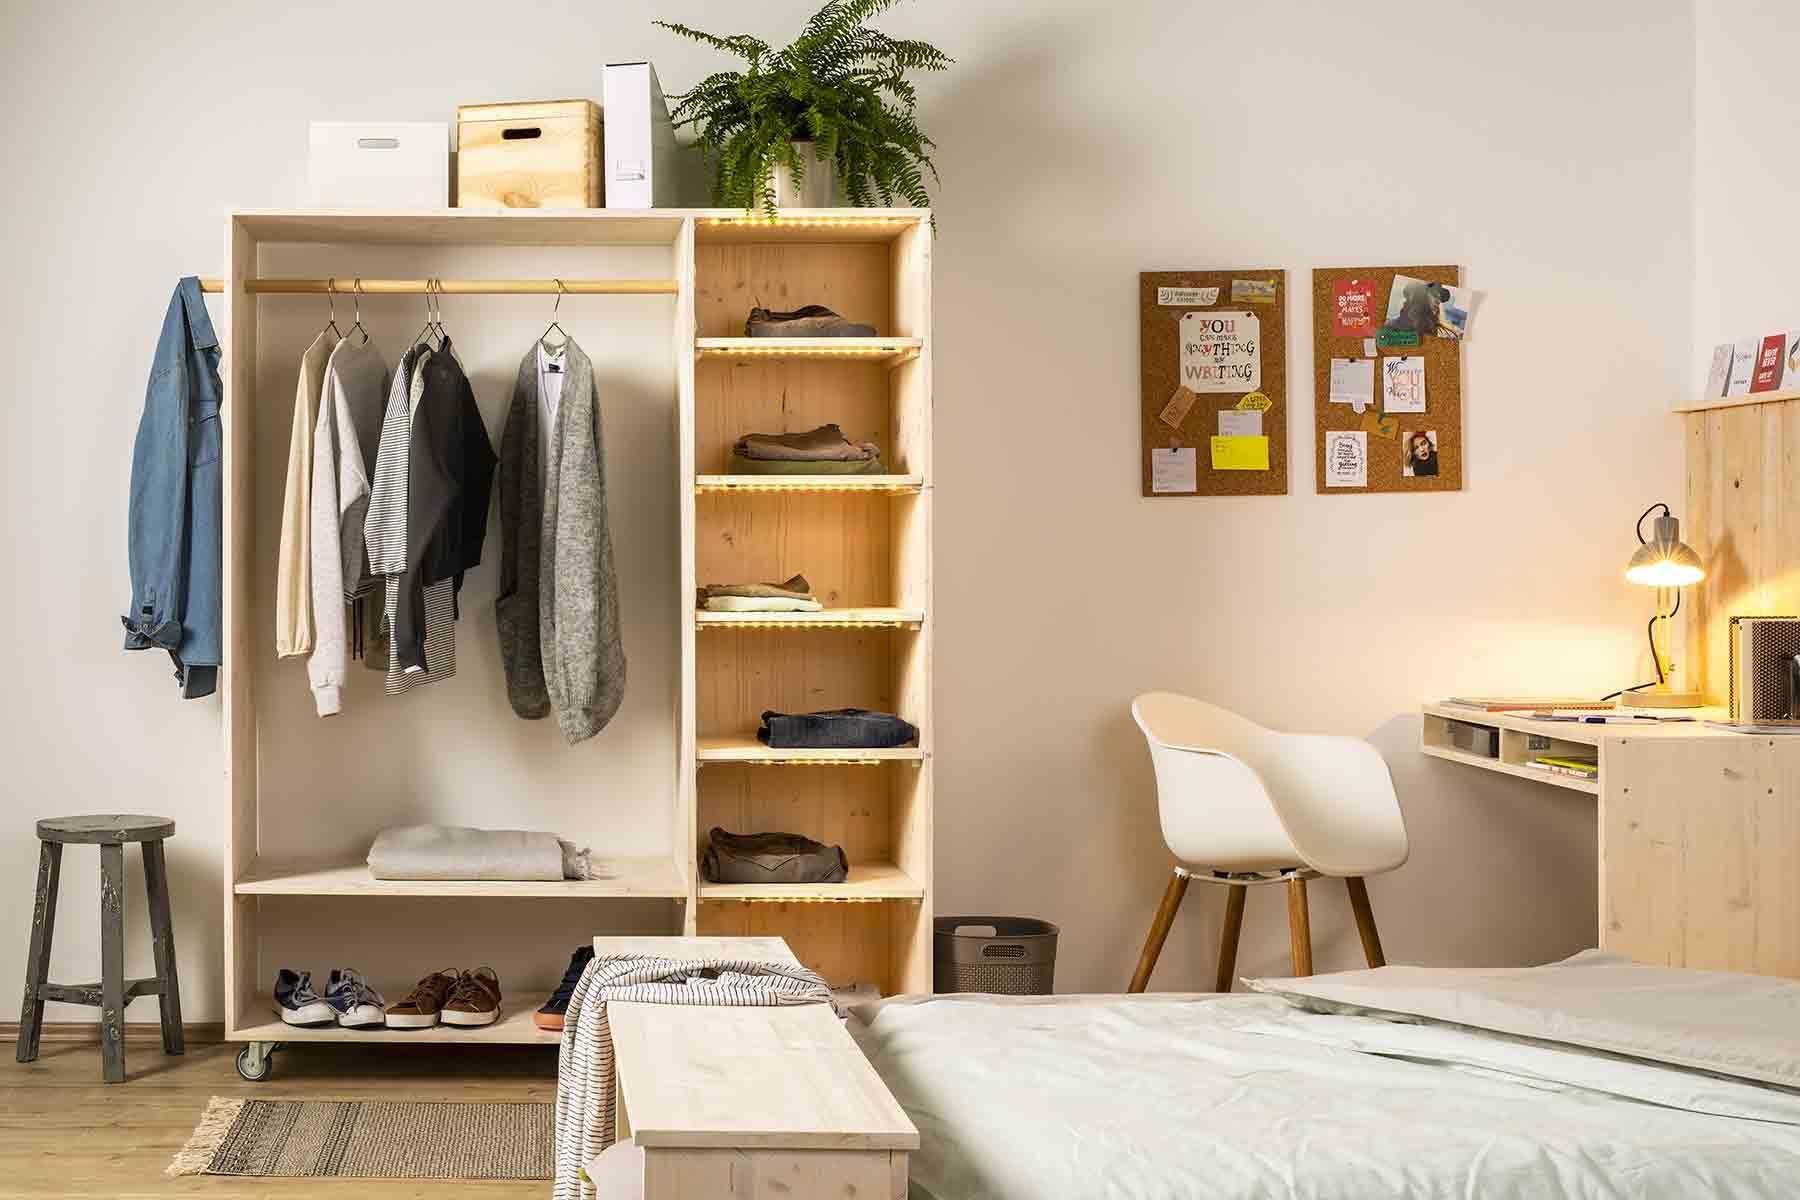 Flurmobel Lisa Selber Bauen Alle Mobel Create By Obi In 2020 Schrank Selber Bauen Diy Mobel Kleiderschrank Flur Mobel